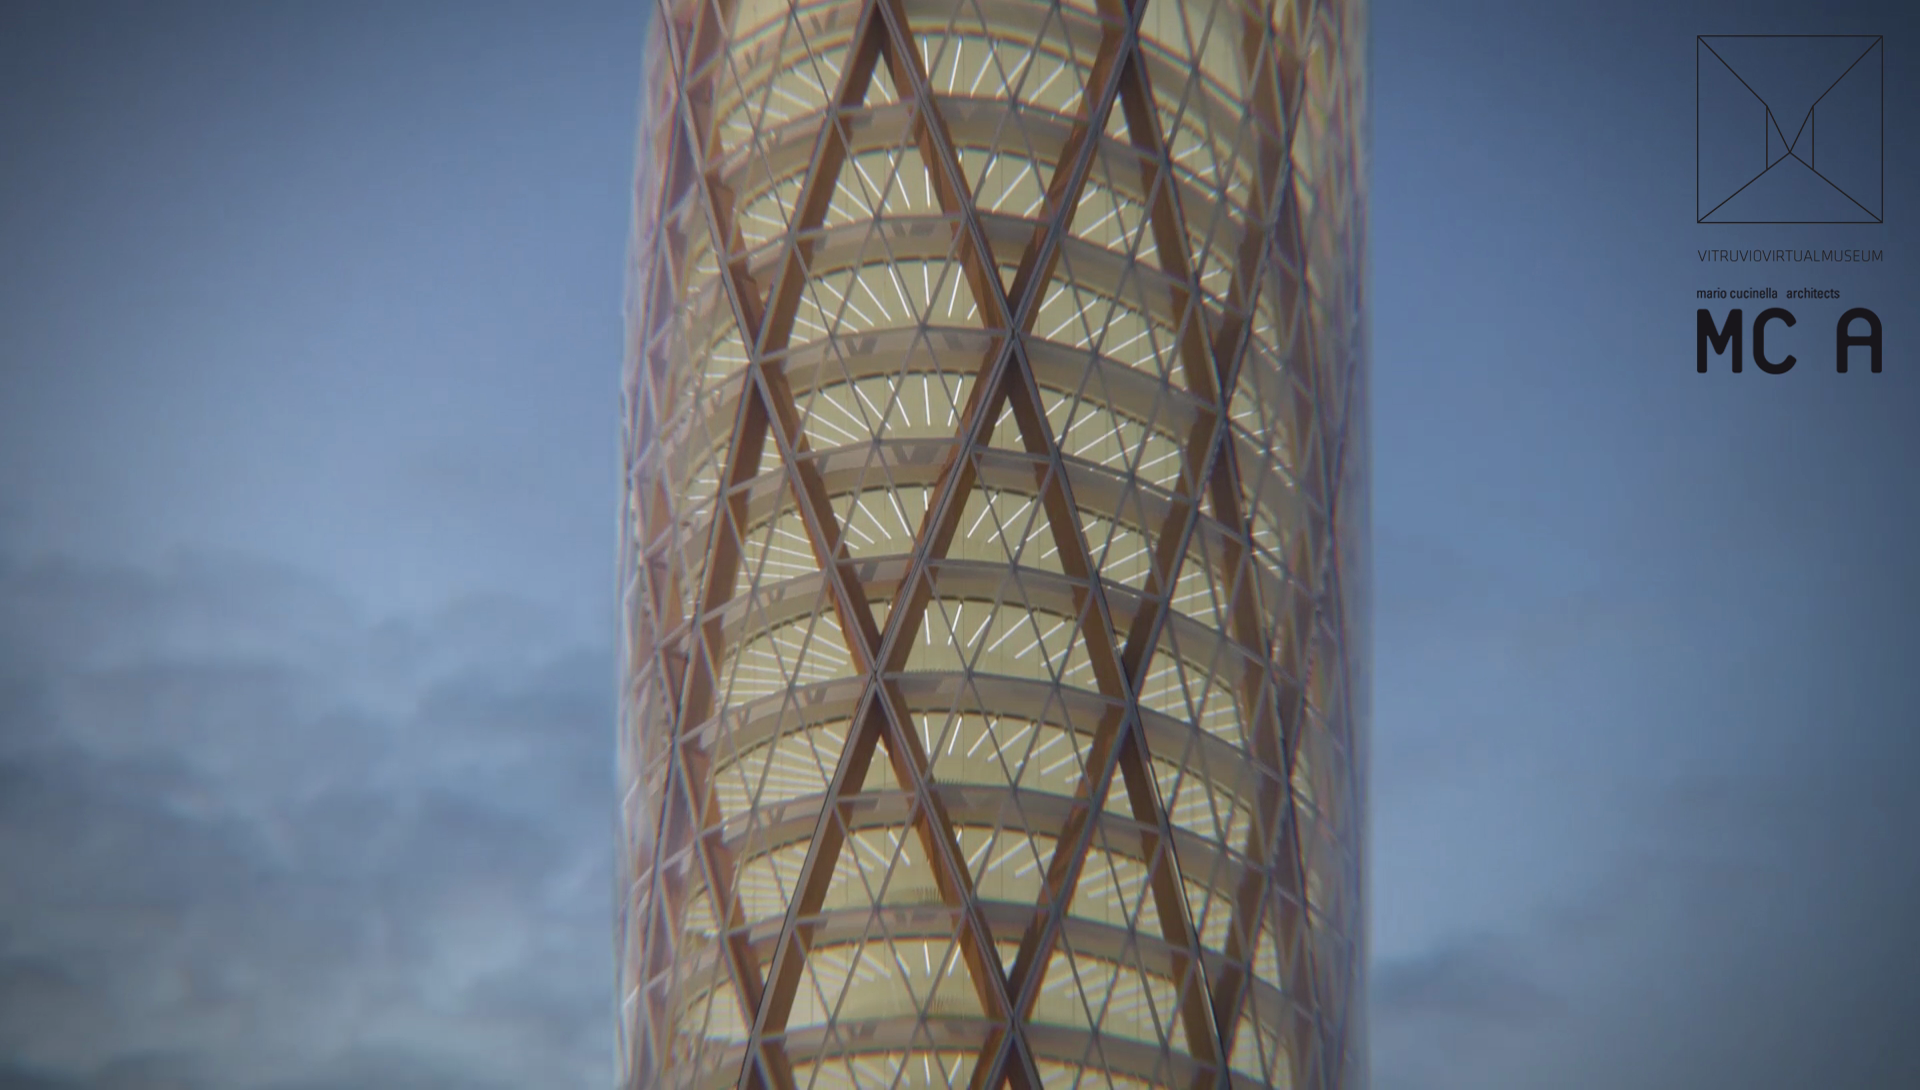 Empatia Creativa Milano metropolitana: cinque cantieri di Mario Cucinella Architects